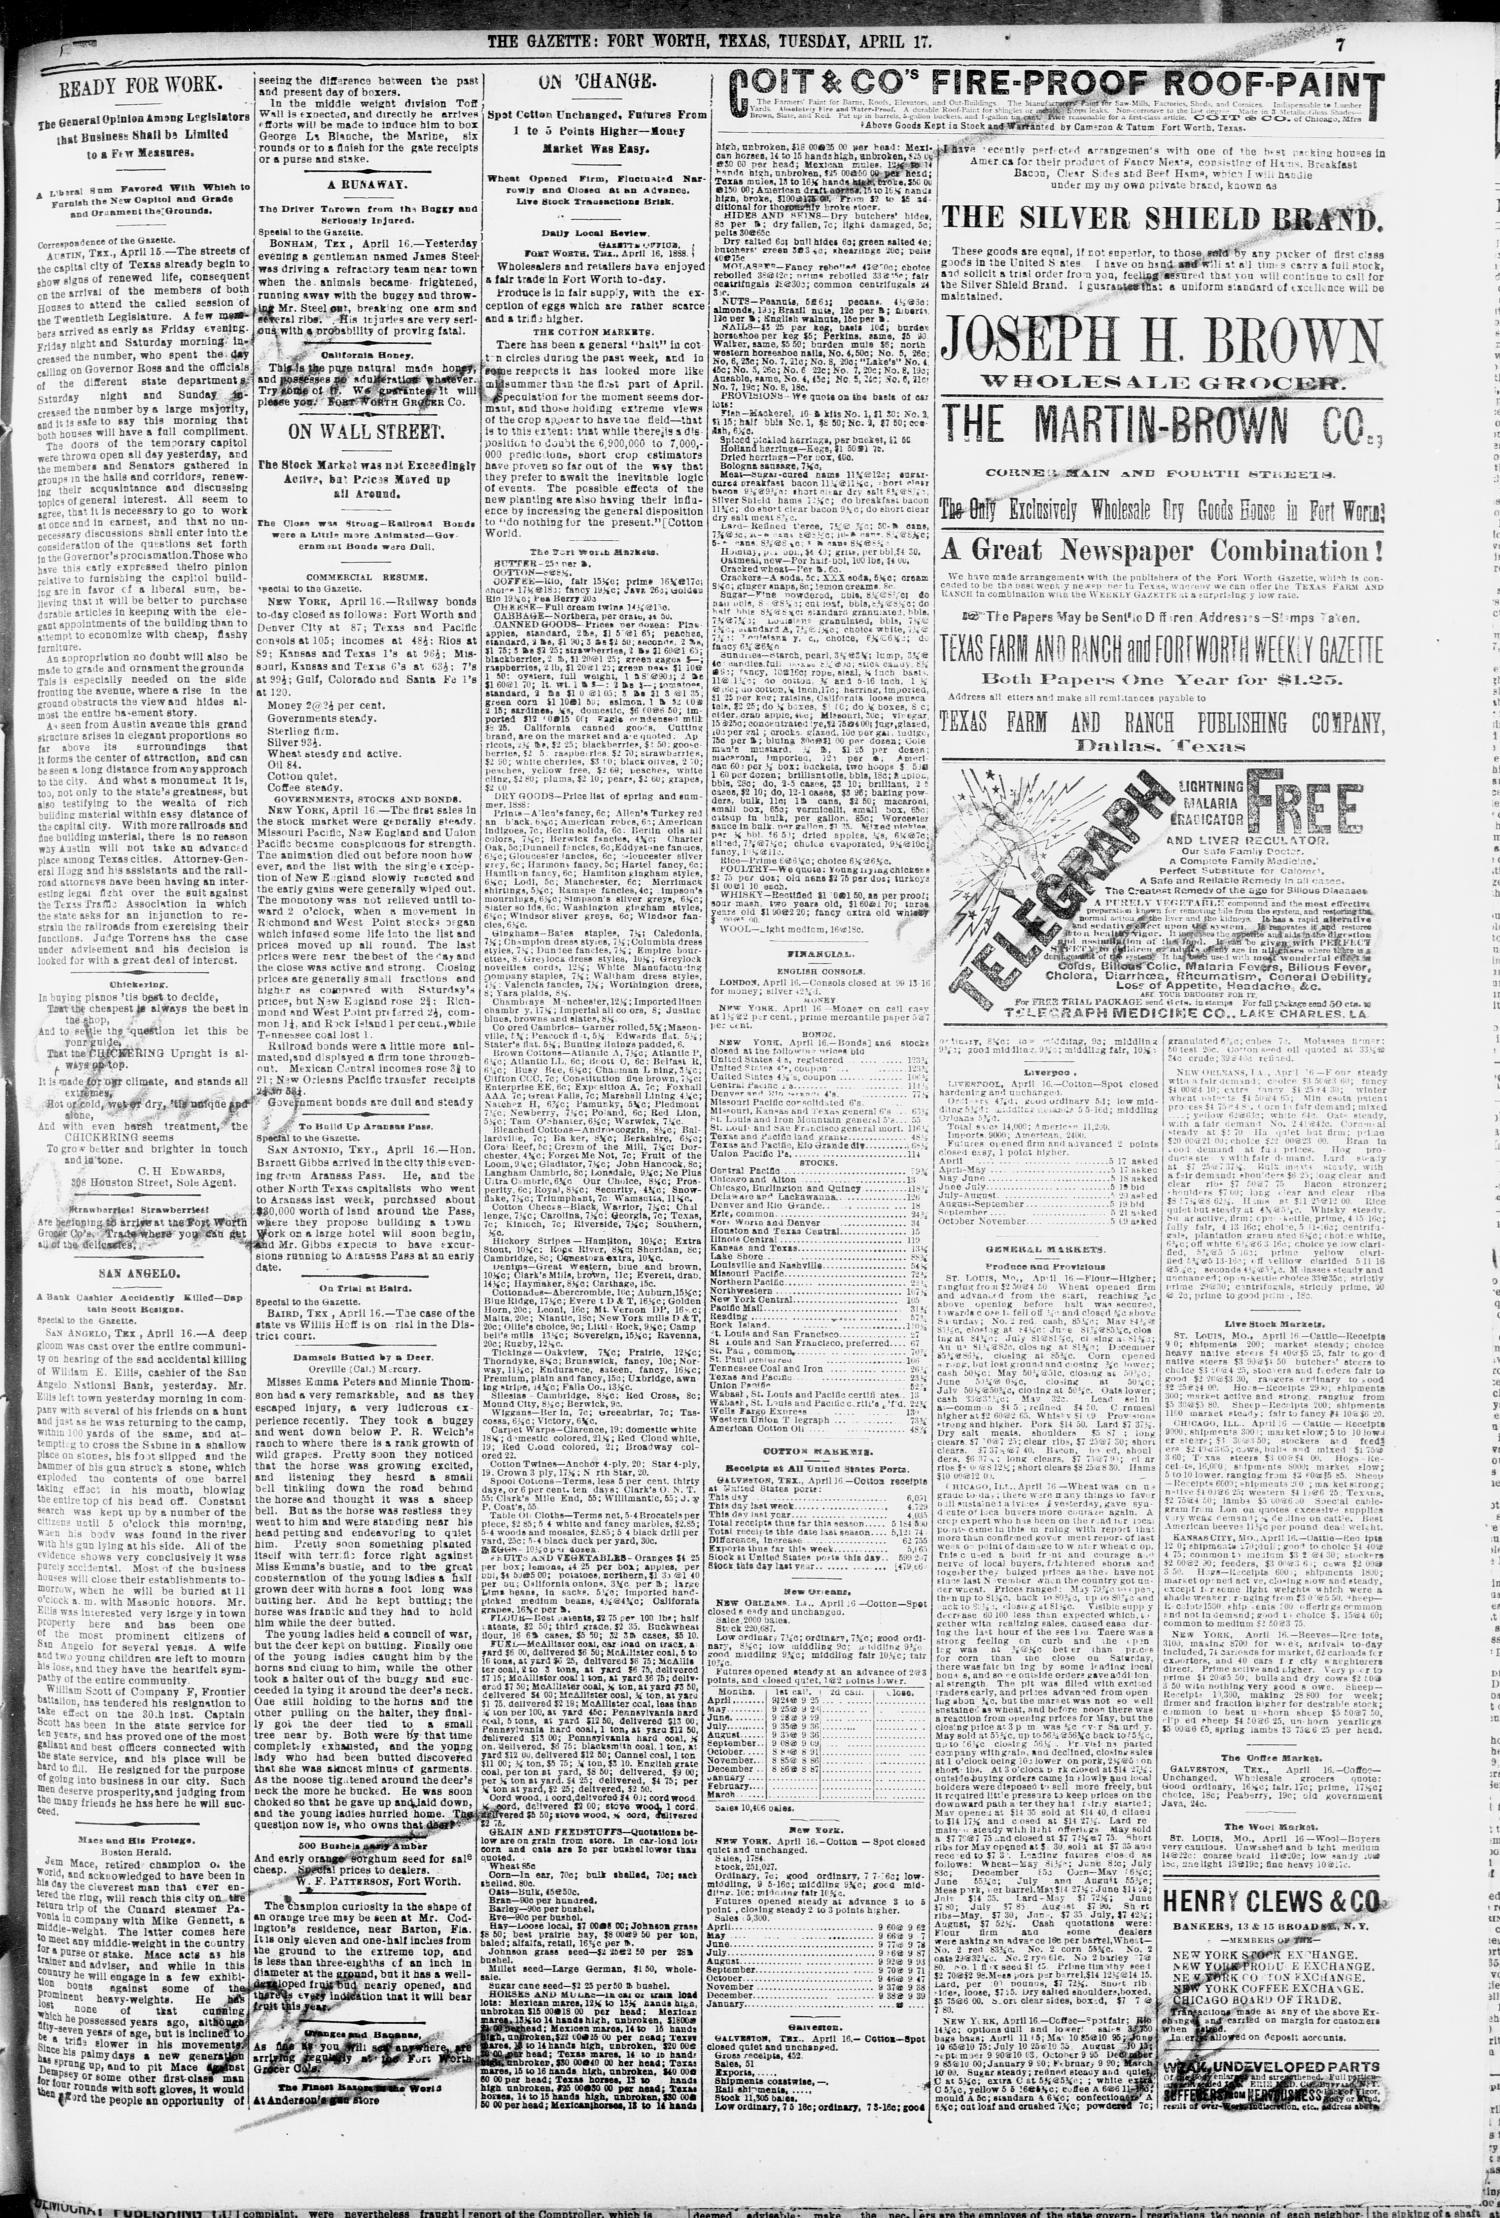 Fort Worth Daily Gazette  (Fort Worth, Tex ), Vol  13, No